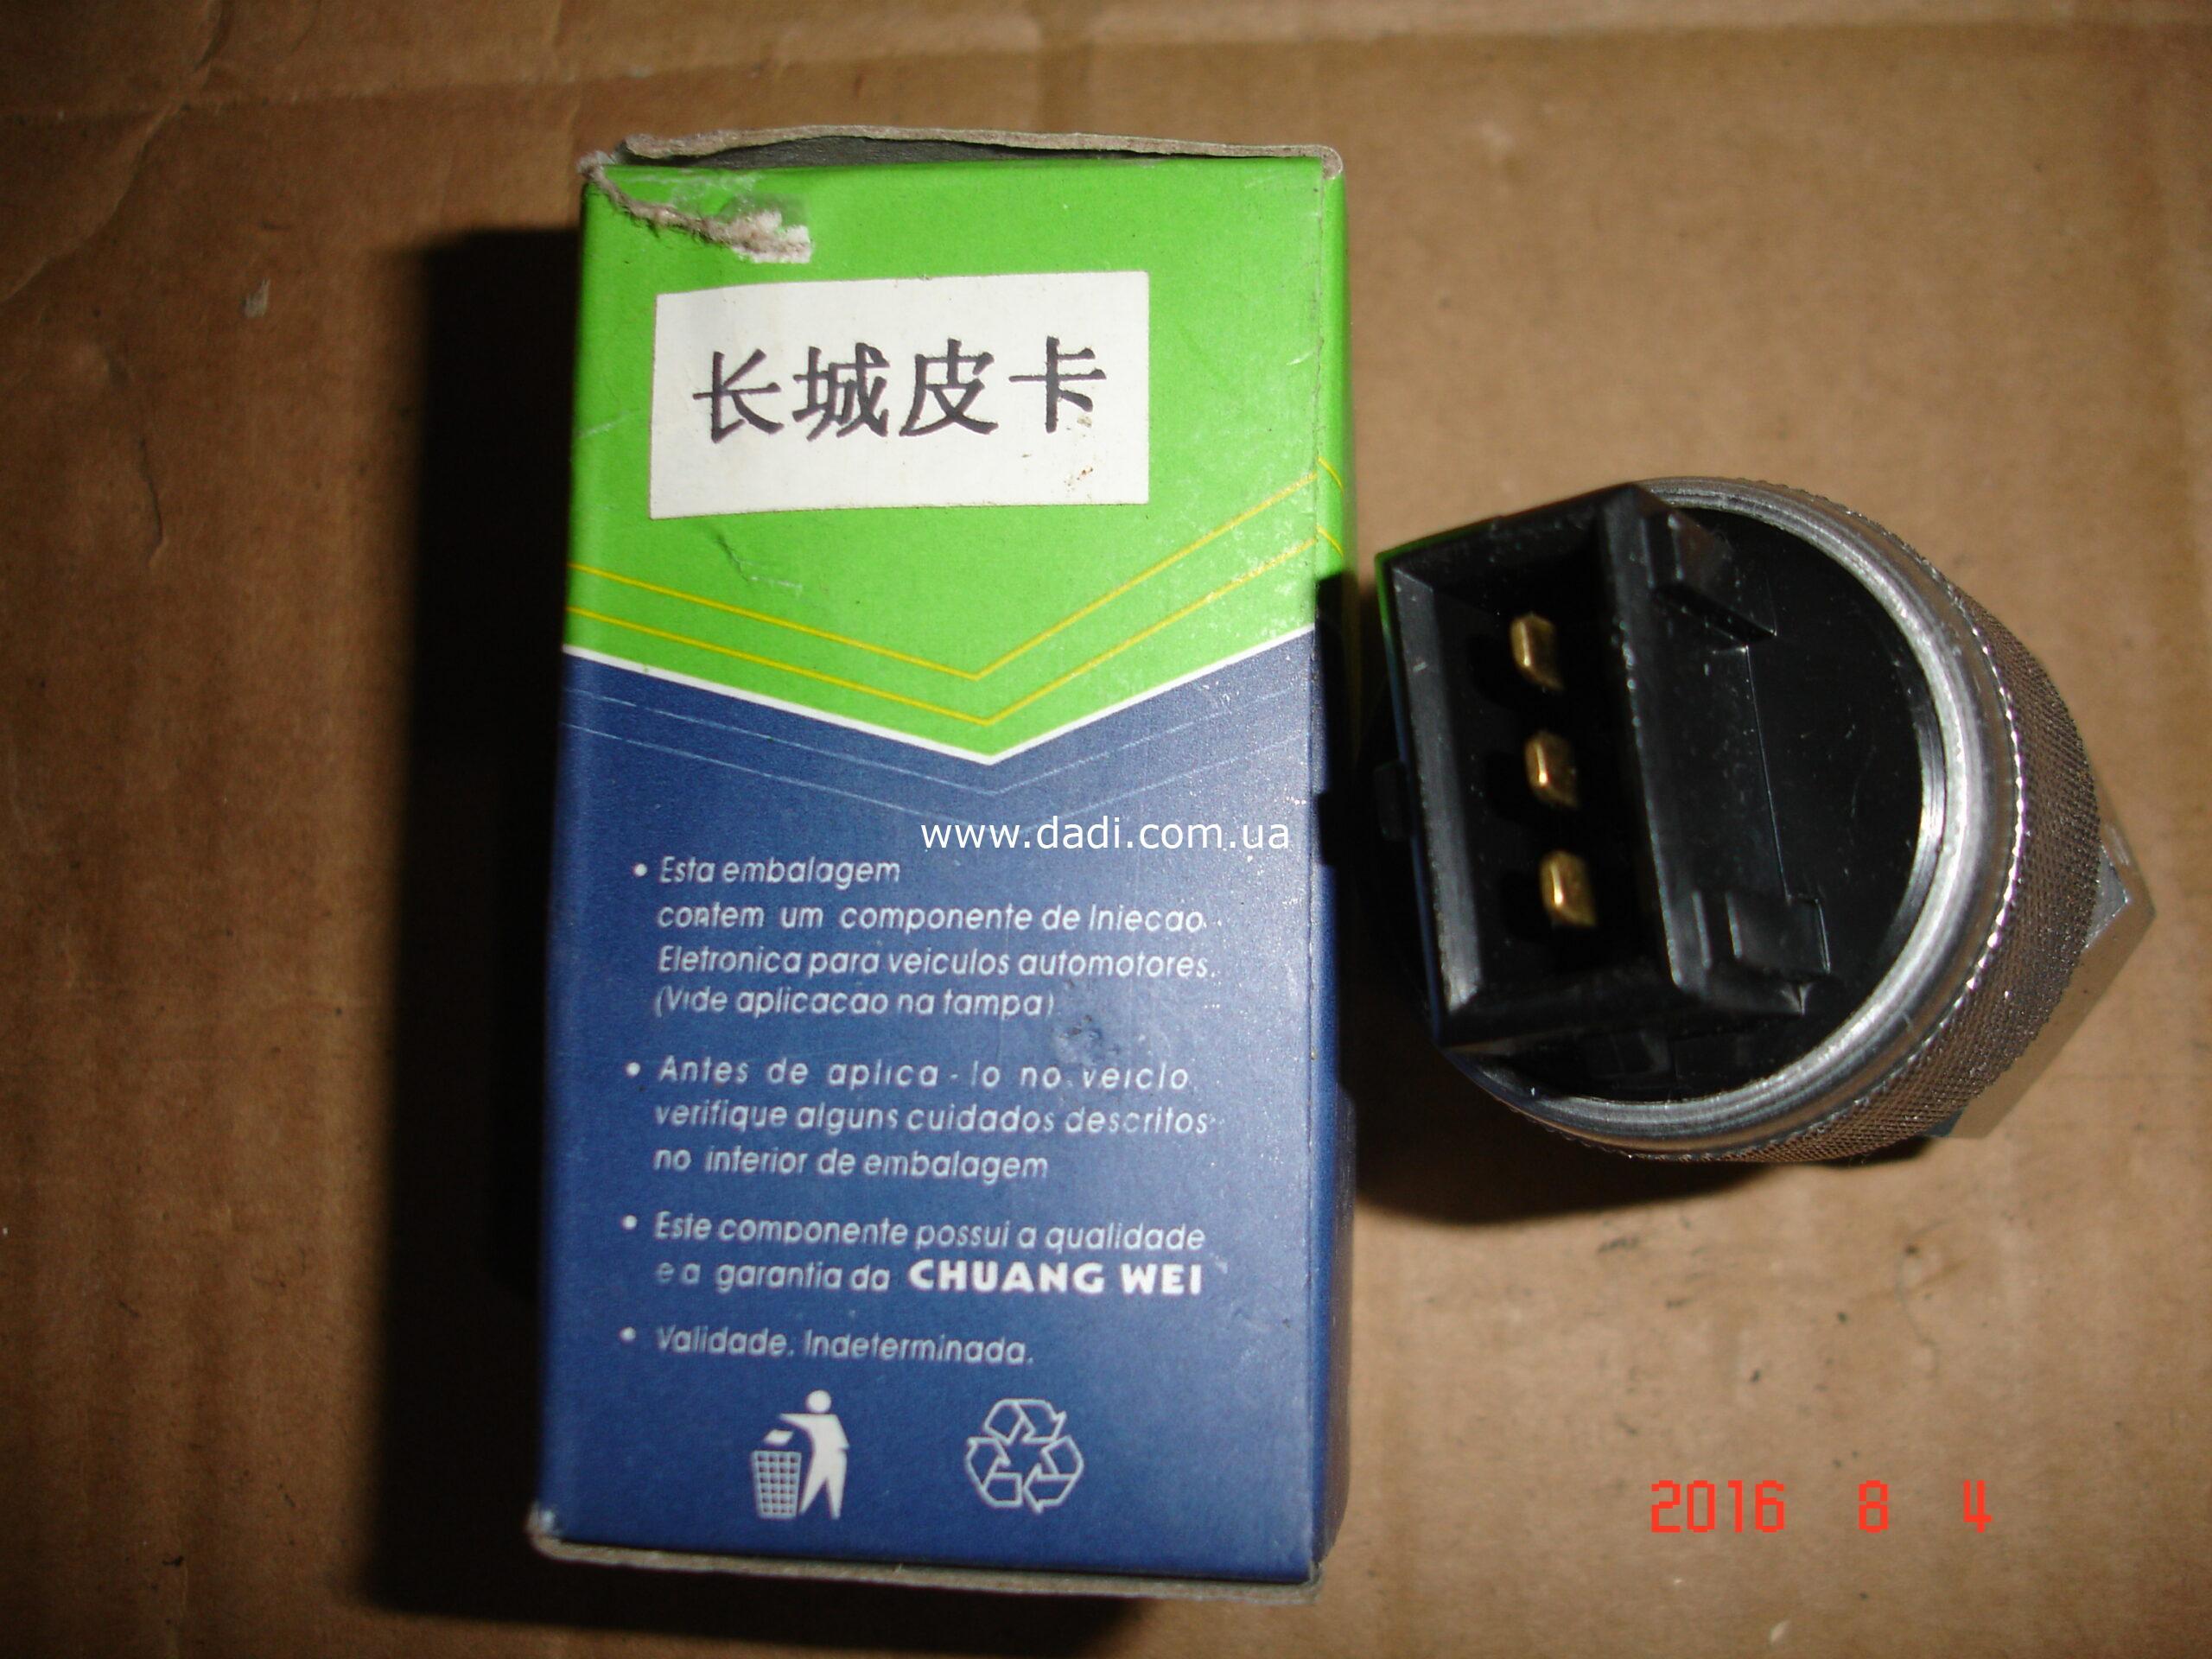 Датчик швидкості/ датчик скорости 3mm DADI-672